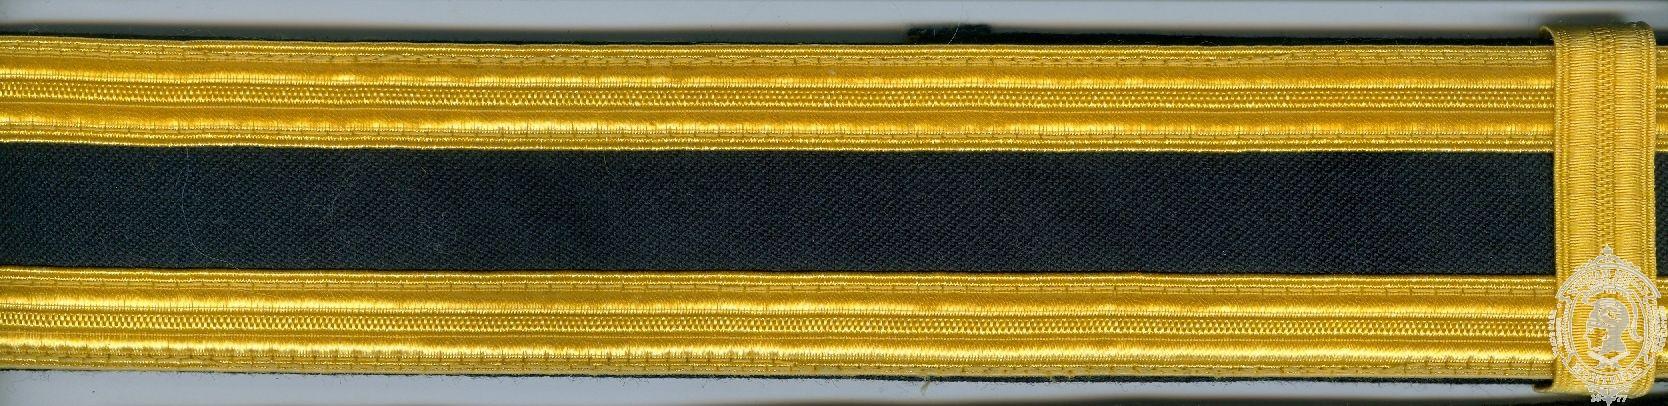 "1-3/4"" Ceremonial Belt, Fabric, 2 Rows 1/2"" Naval Braid"